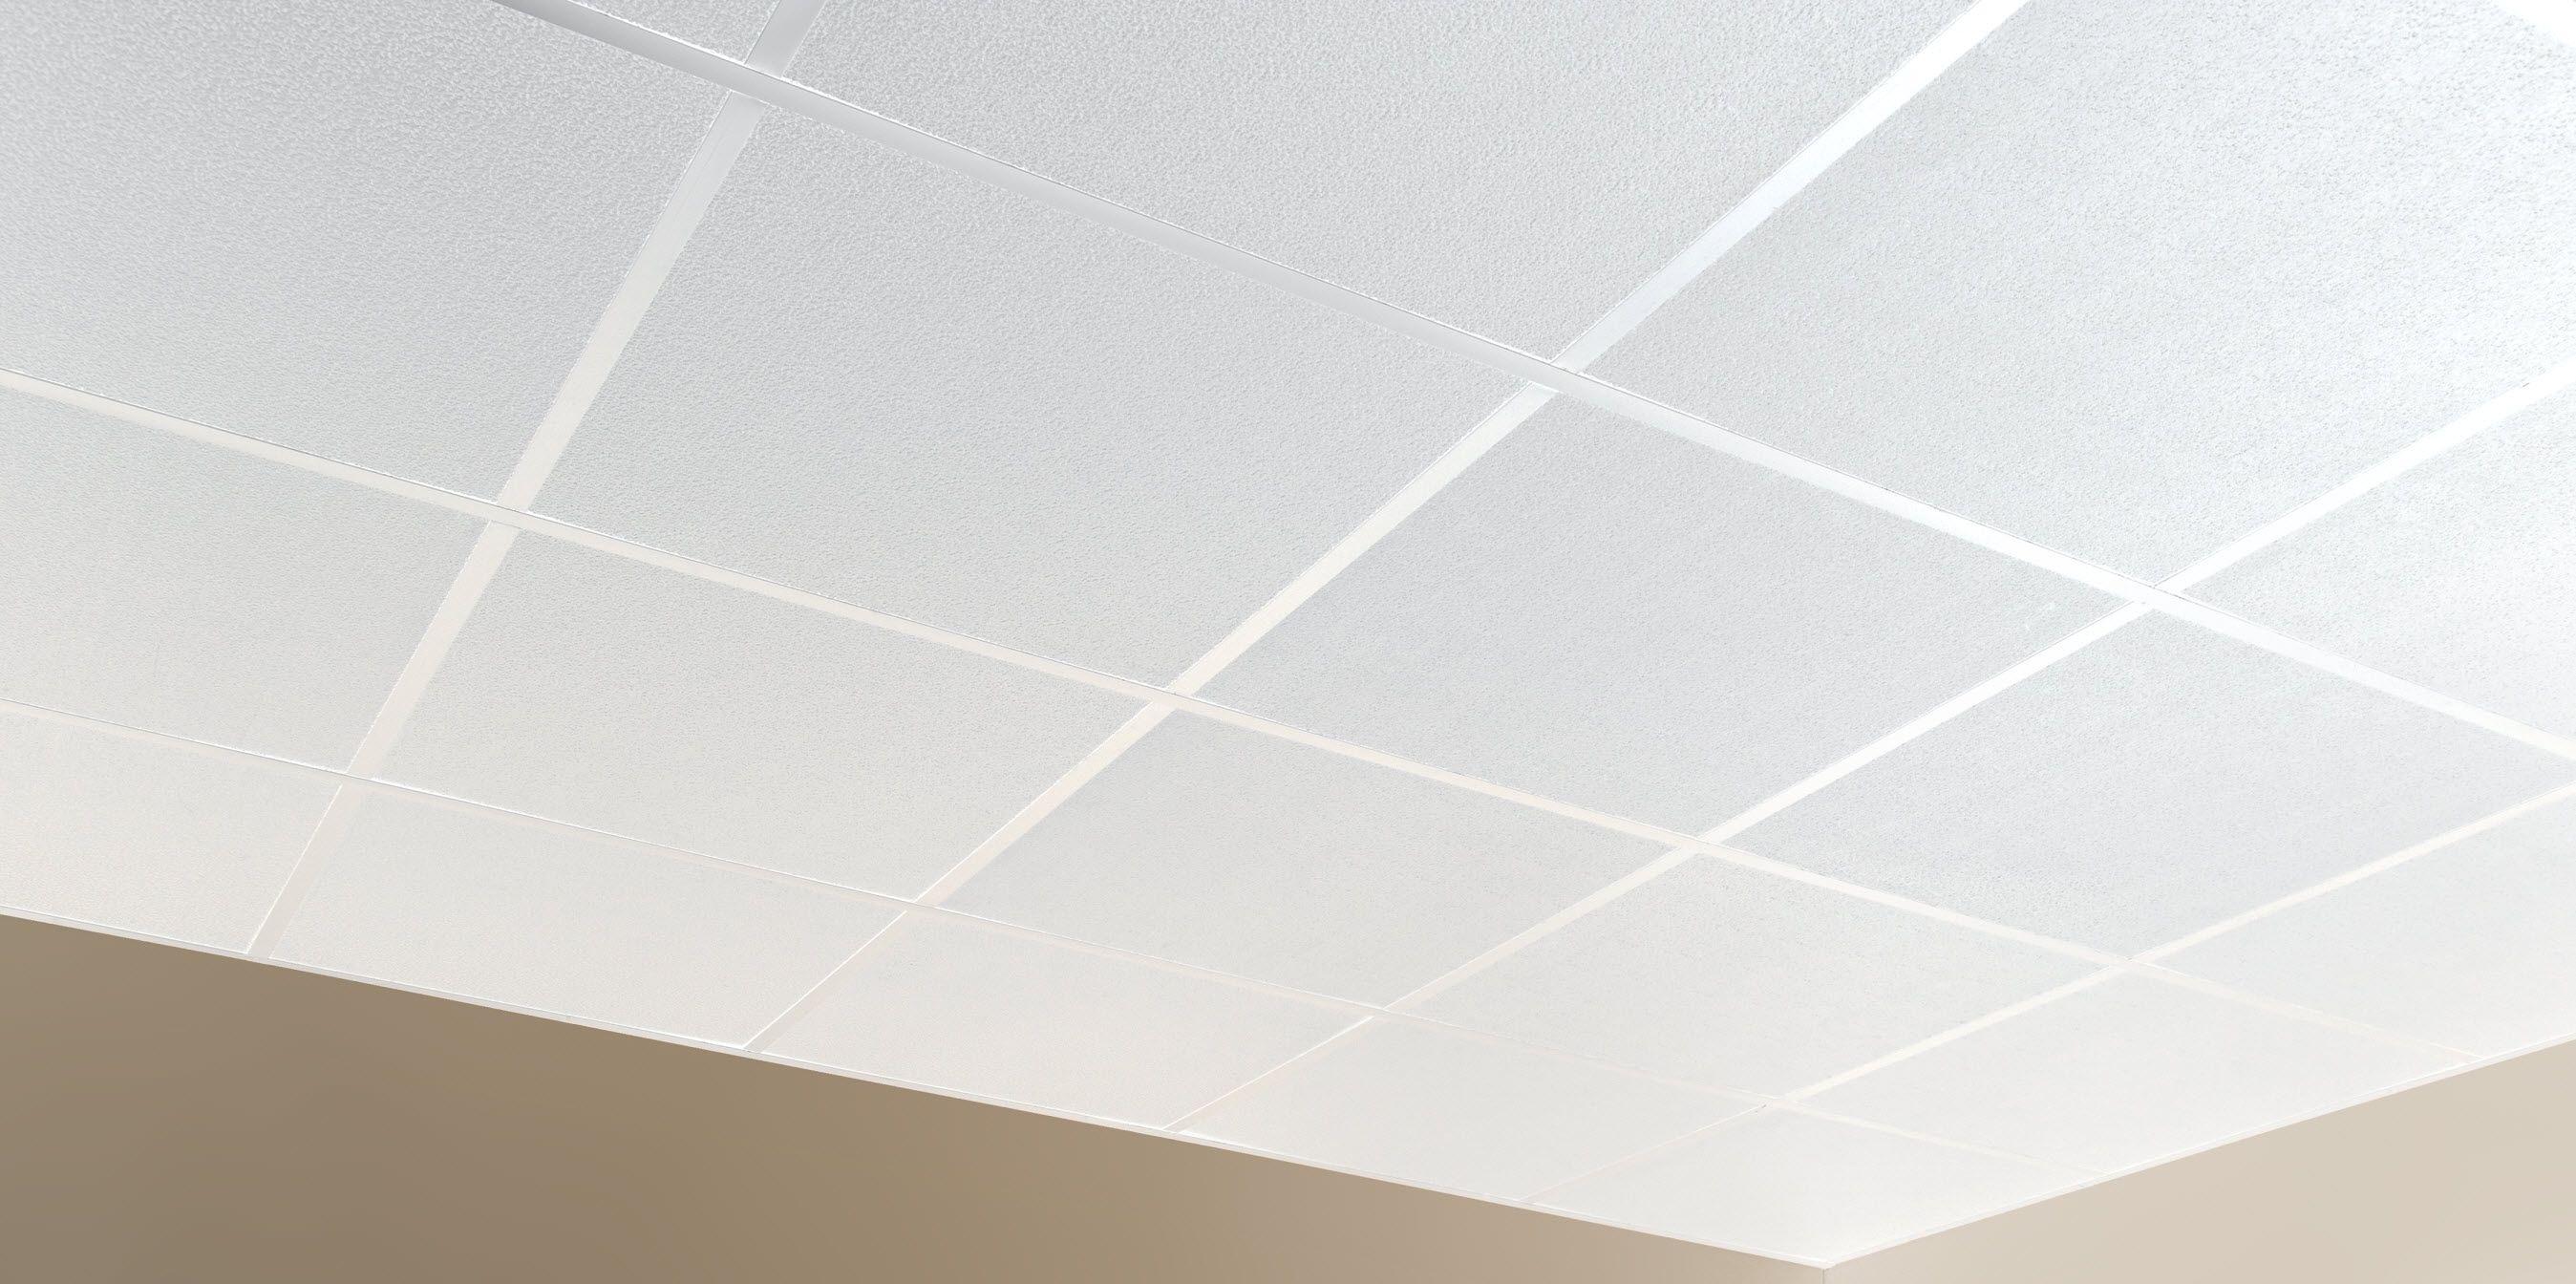 Waterproof Suspended Ceiling Tiles Httpcreativechairsandtables